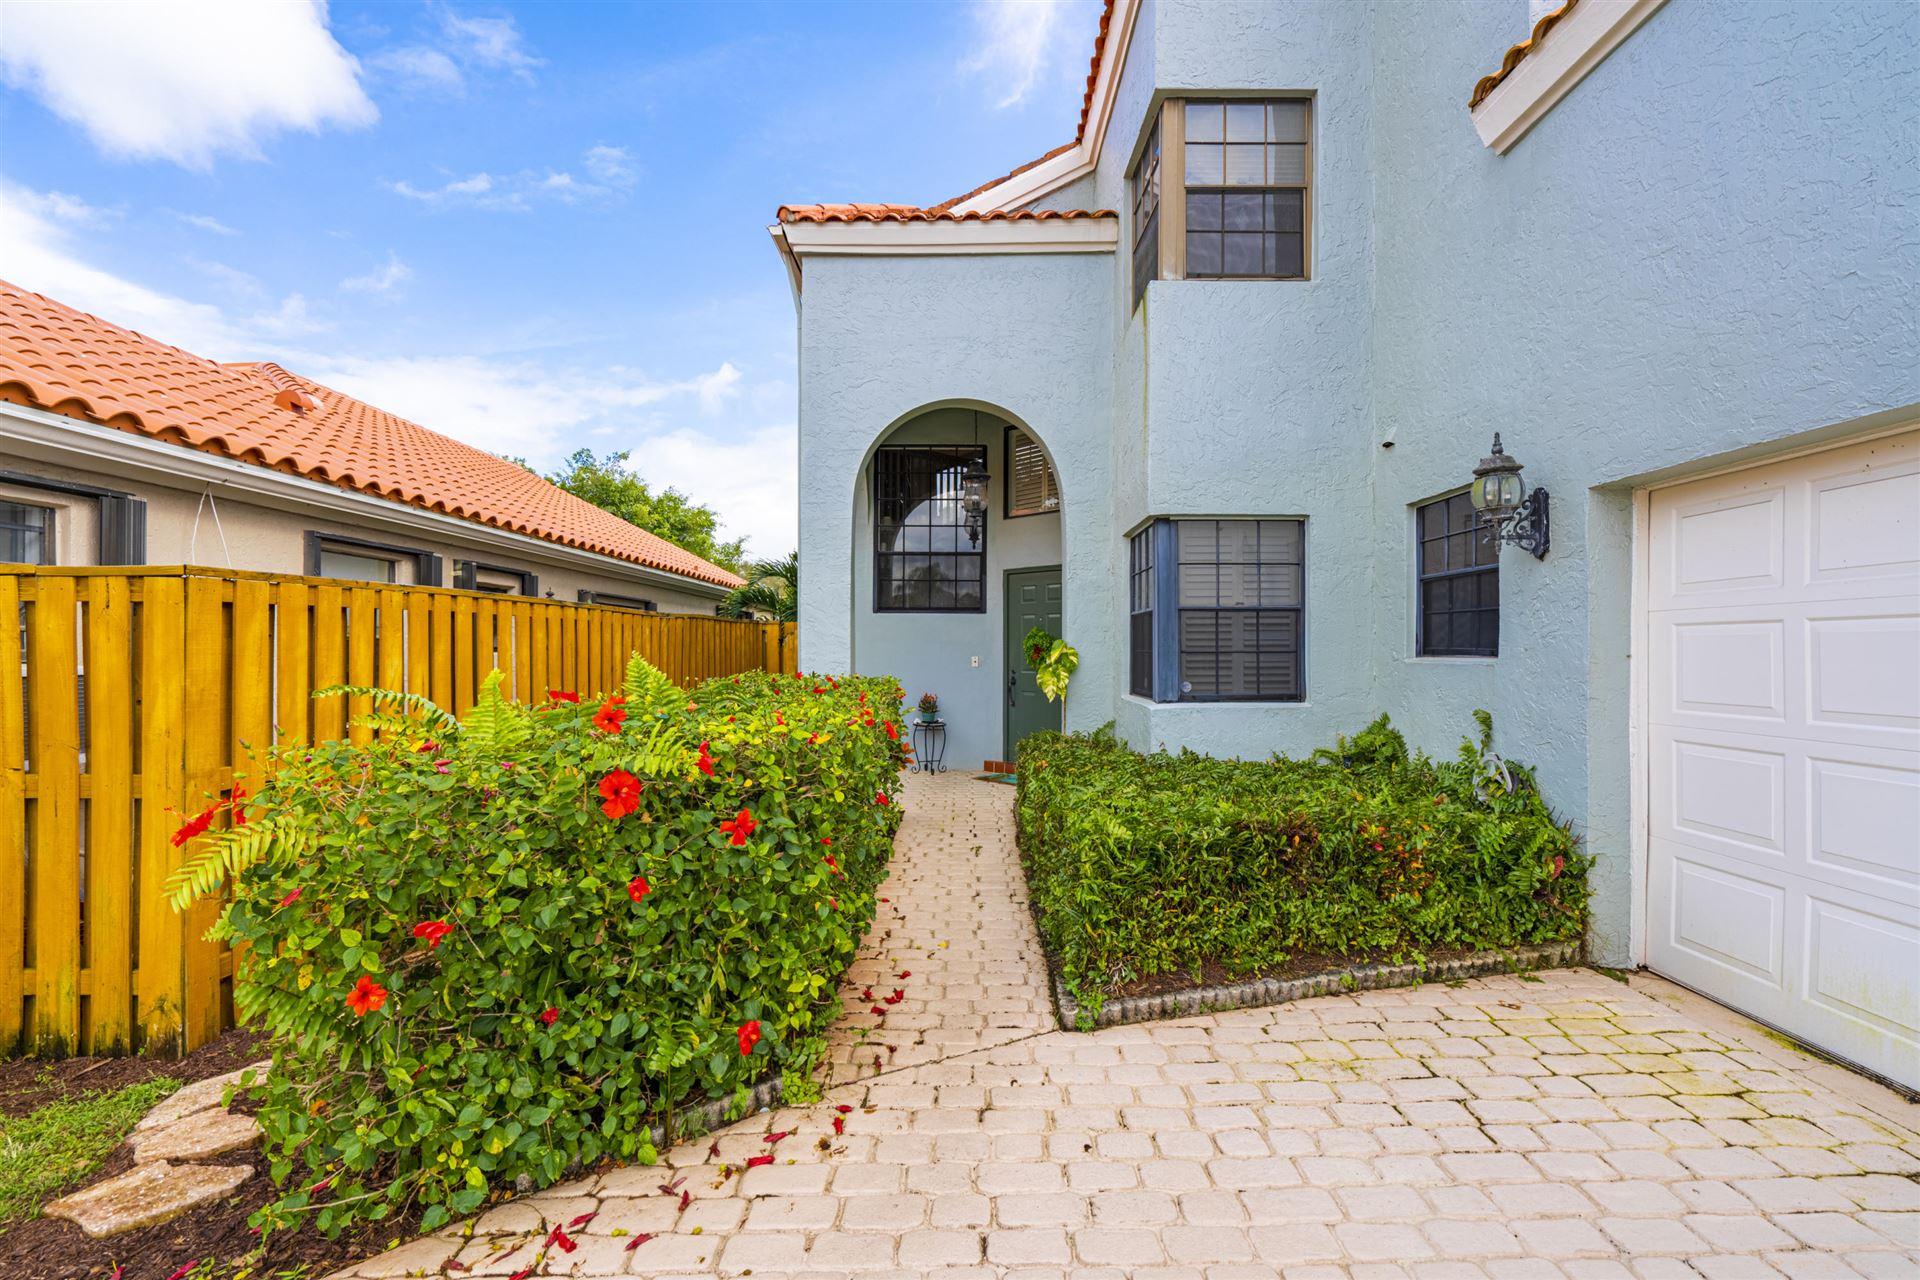 Photo of 13140 Cristal D Arques Drive, Palm Beach Gardens, FL 33410 (MLS # RX-10687958)